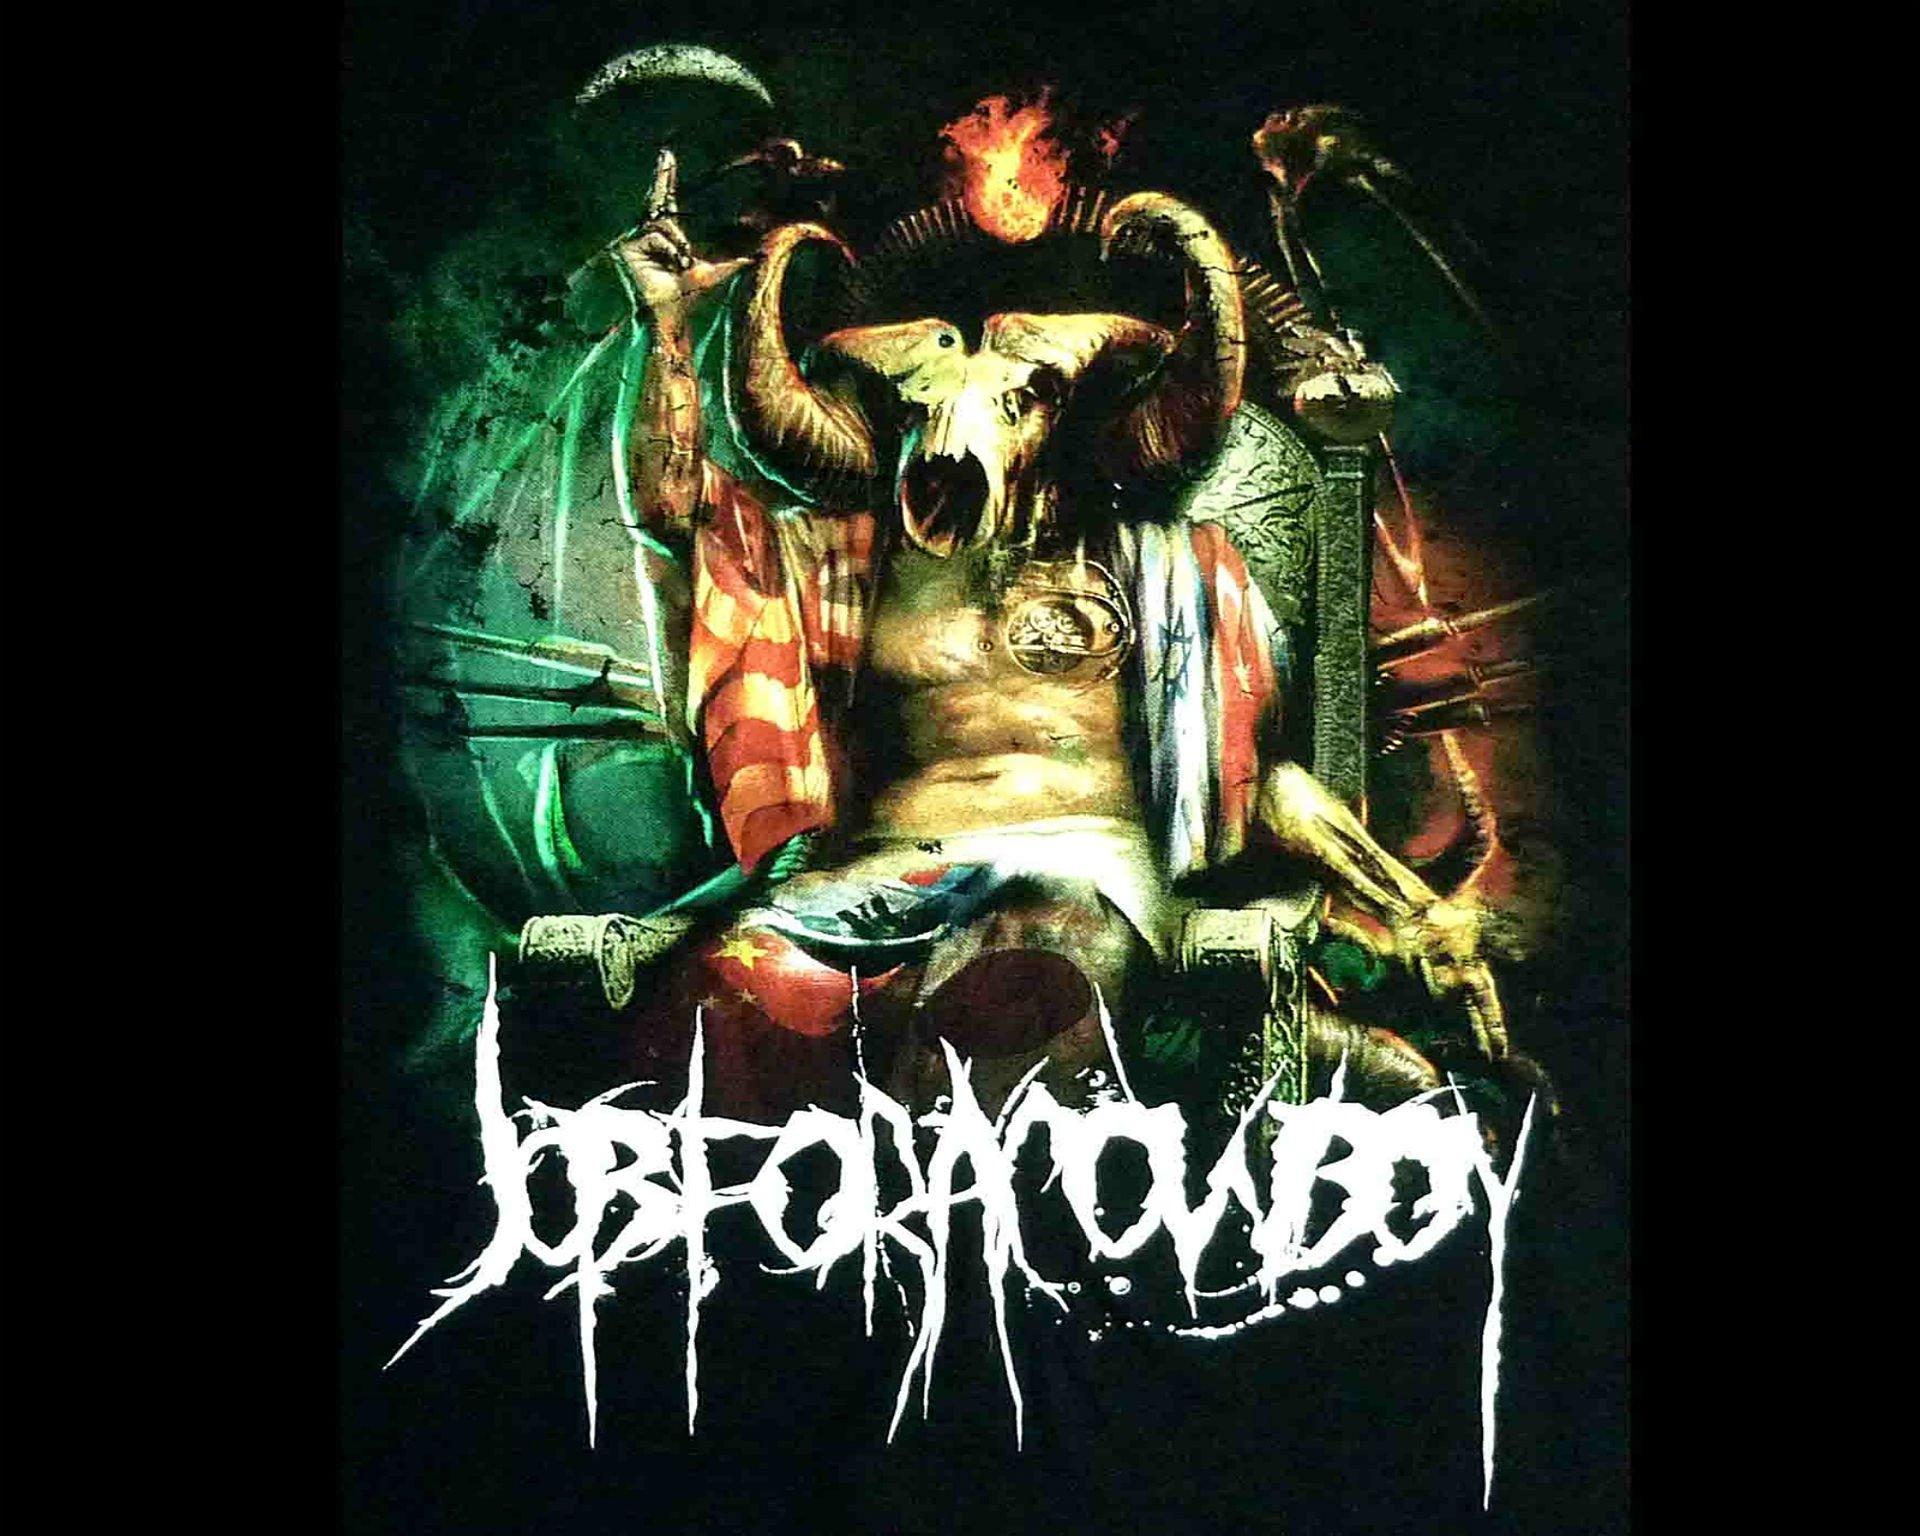 1920x1536 px 1jfac a cowboy dark death deathcore demon evil for heavy job metal occult satan